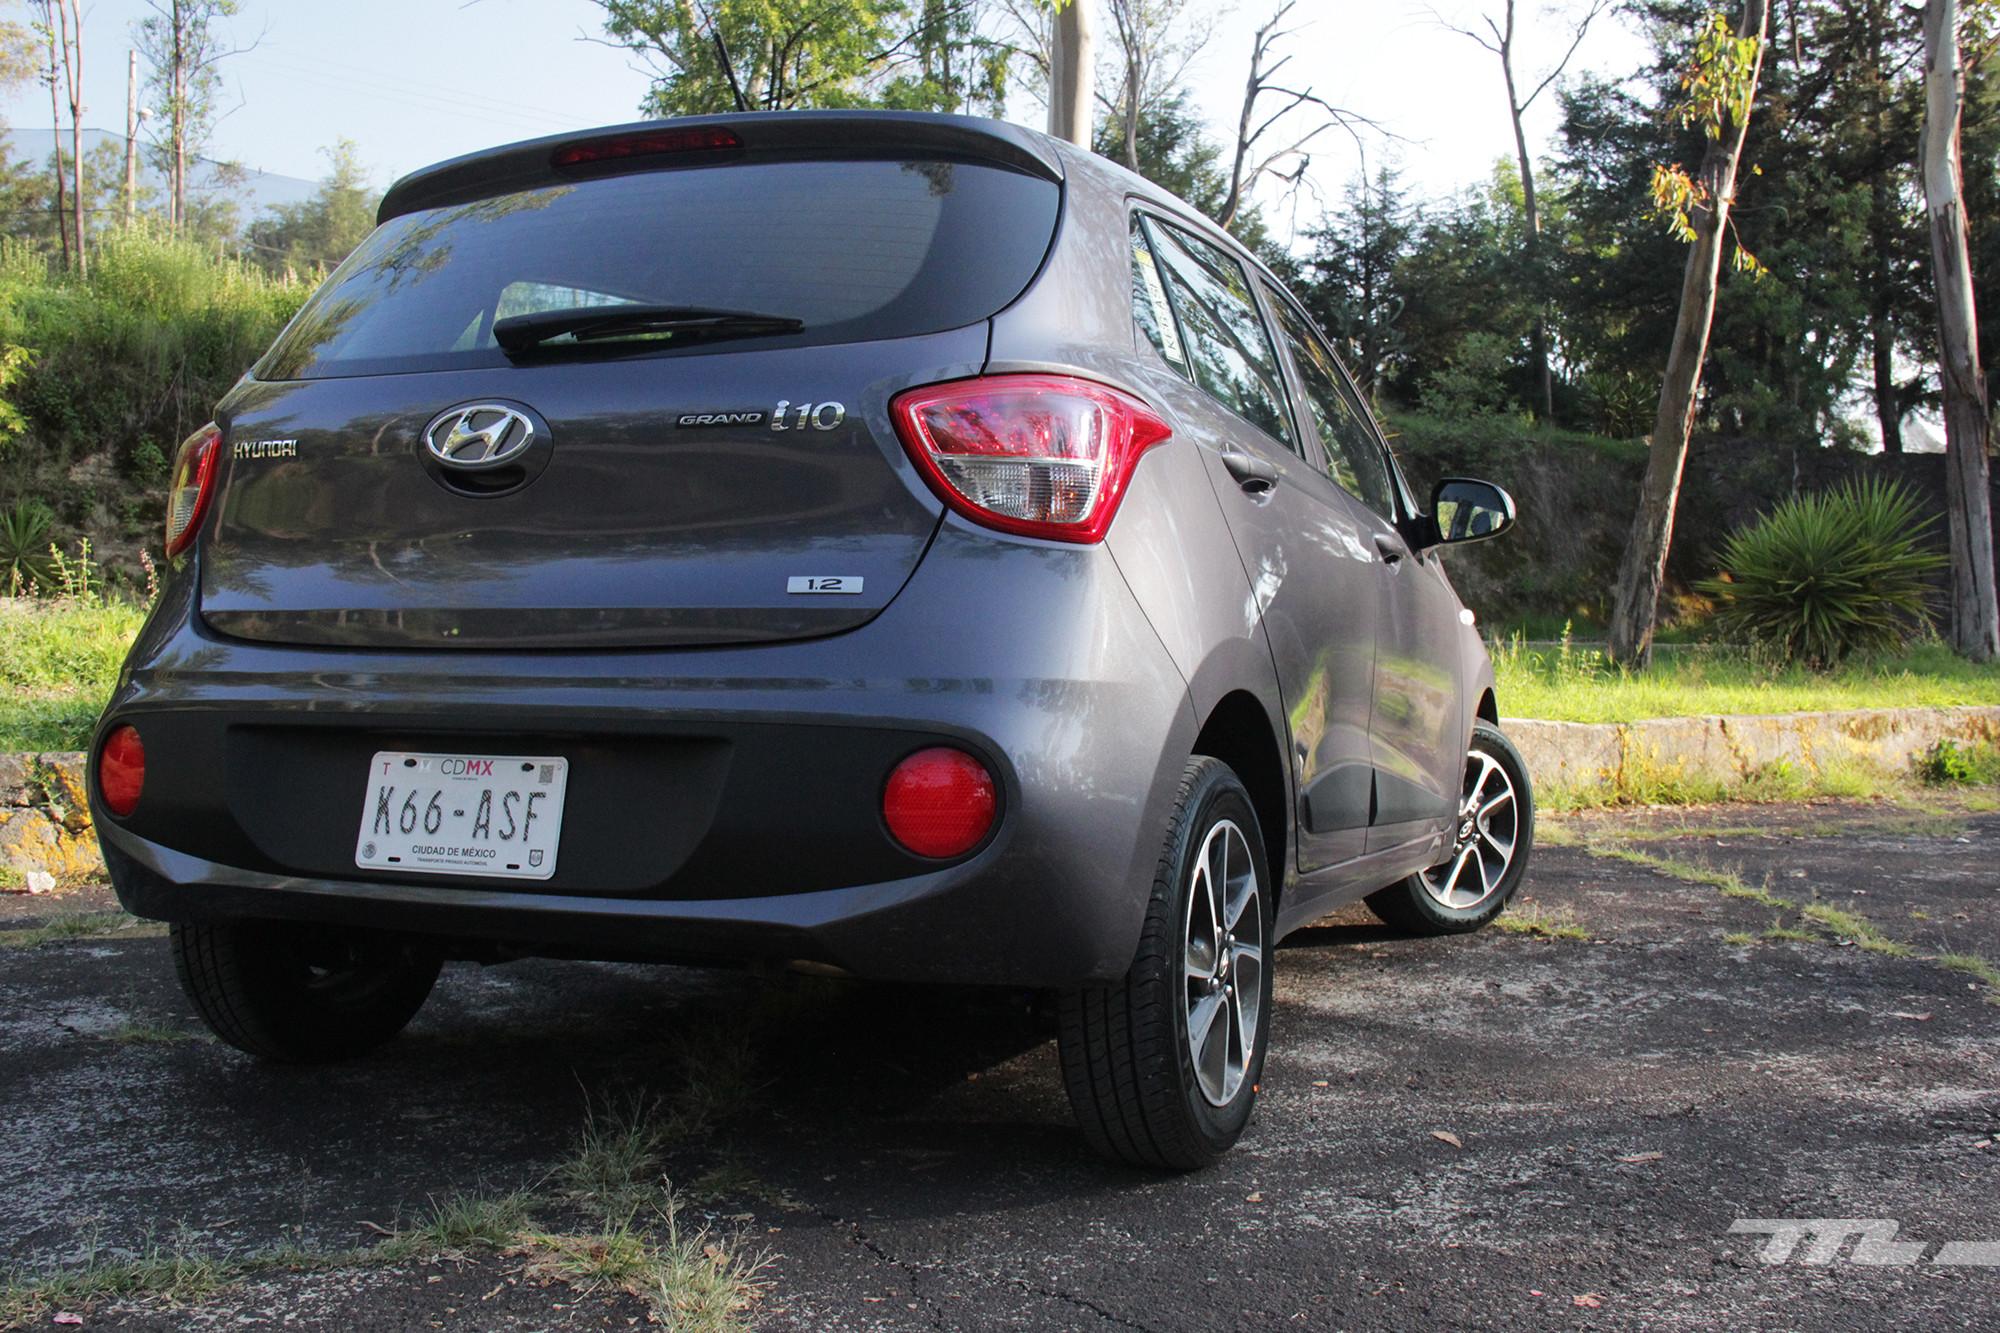 Foto de Hyundai i10 Grand Hatc (5/26)